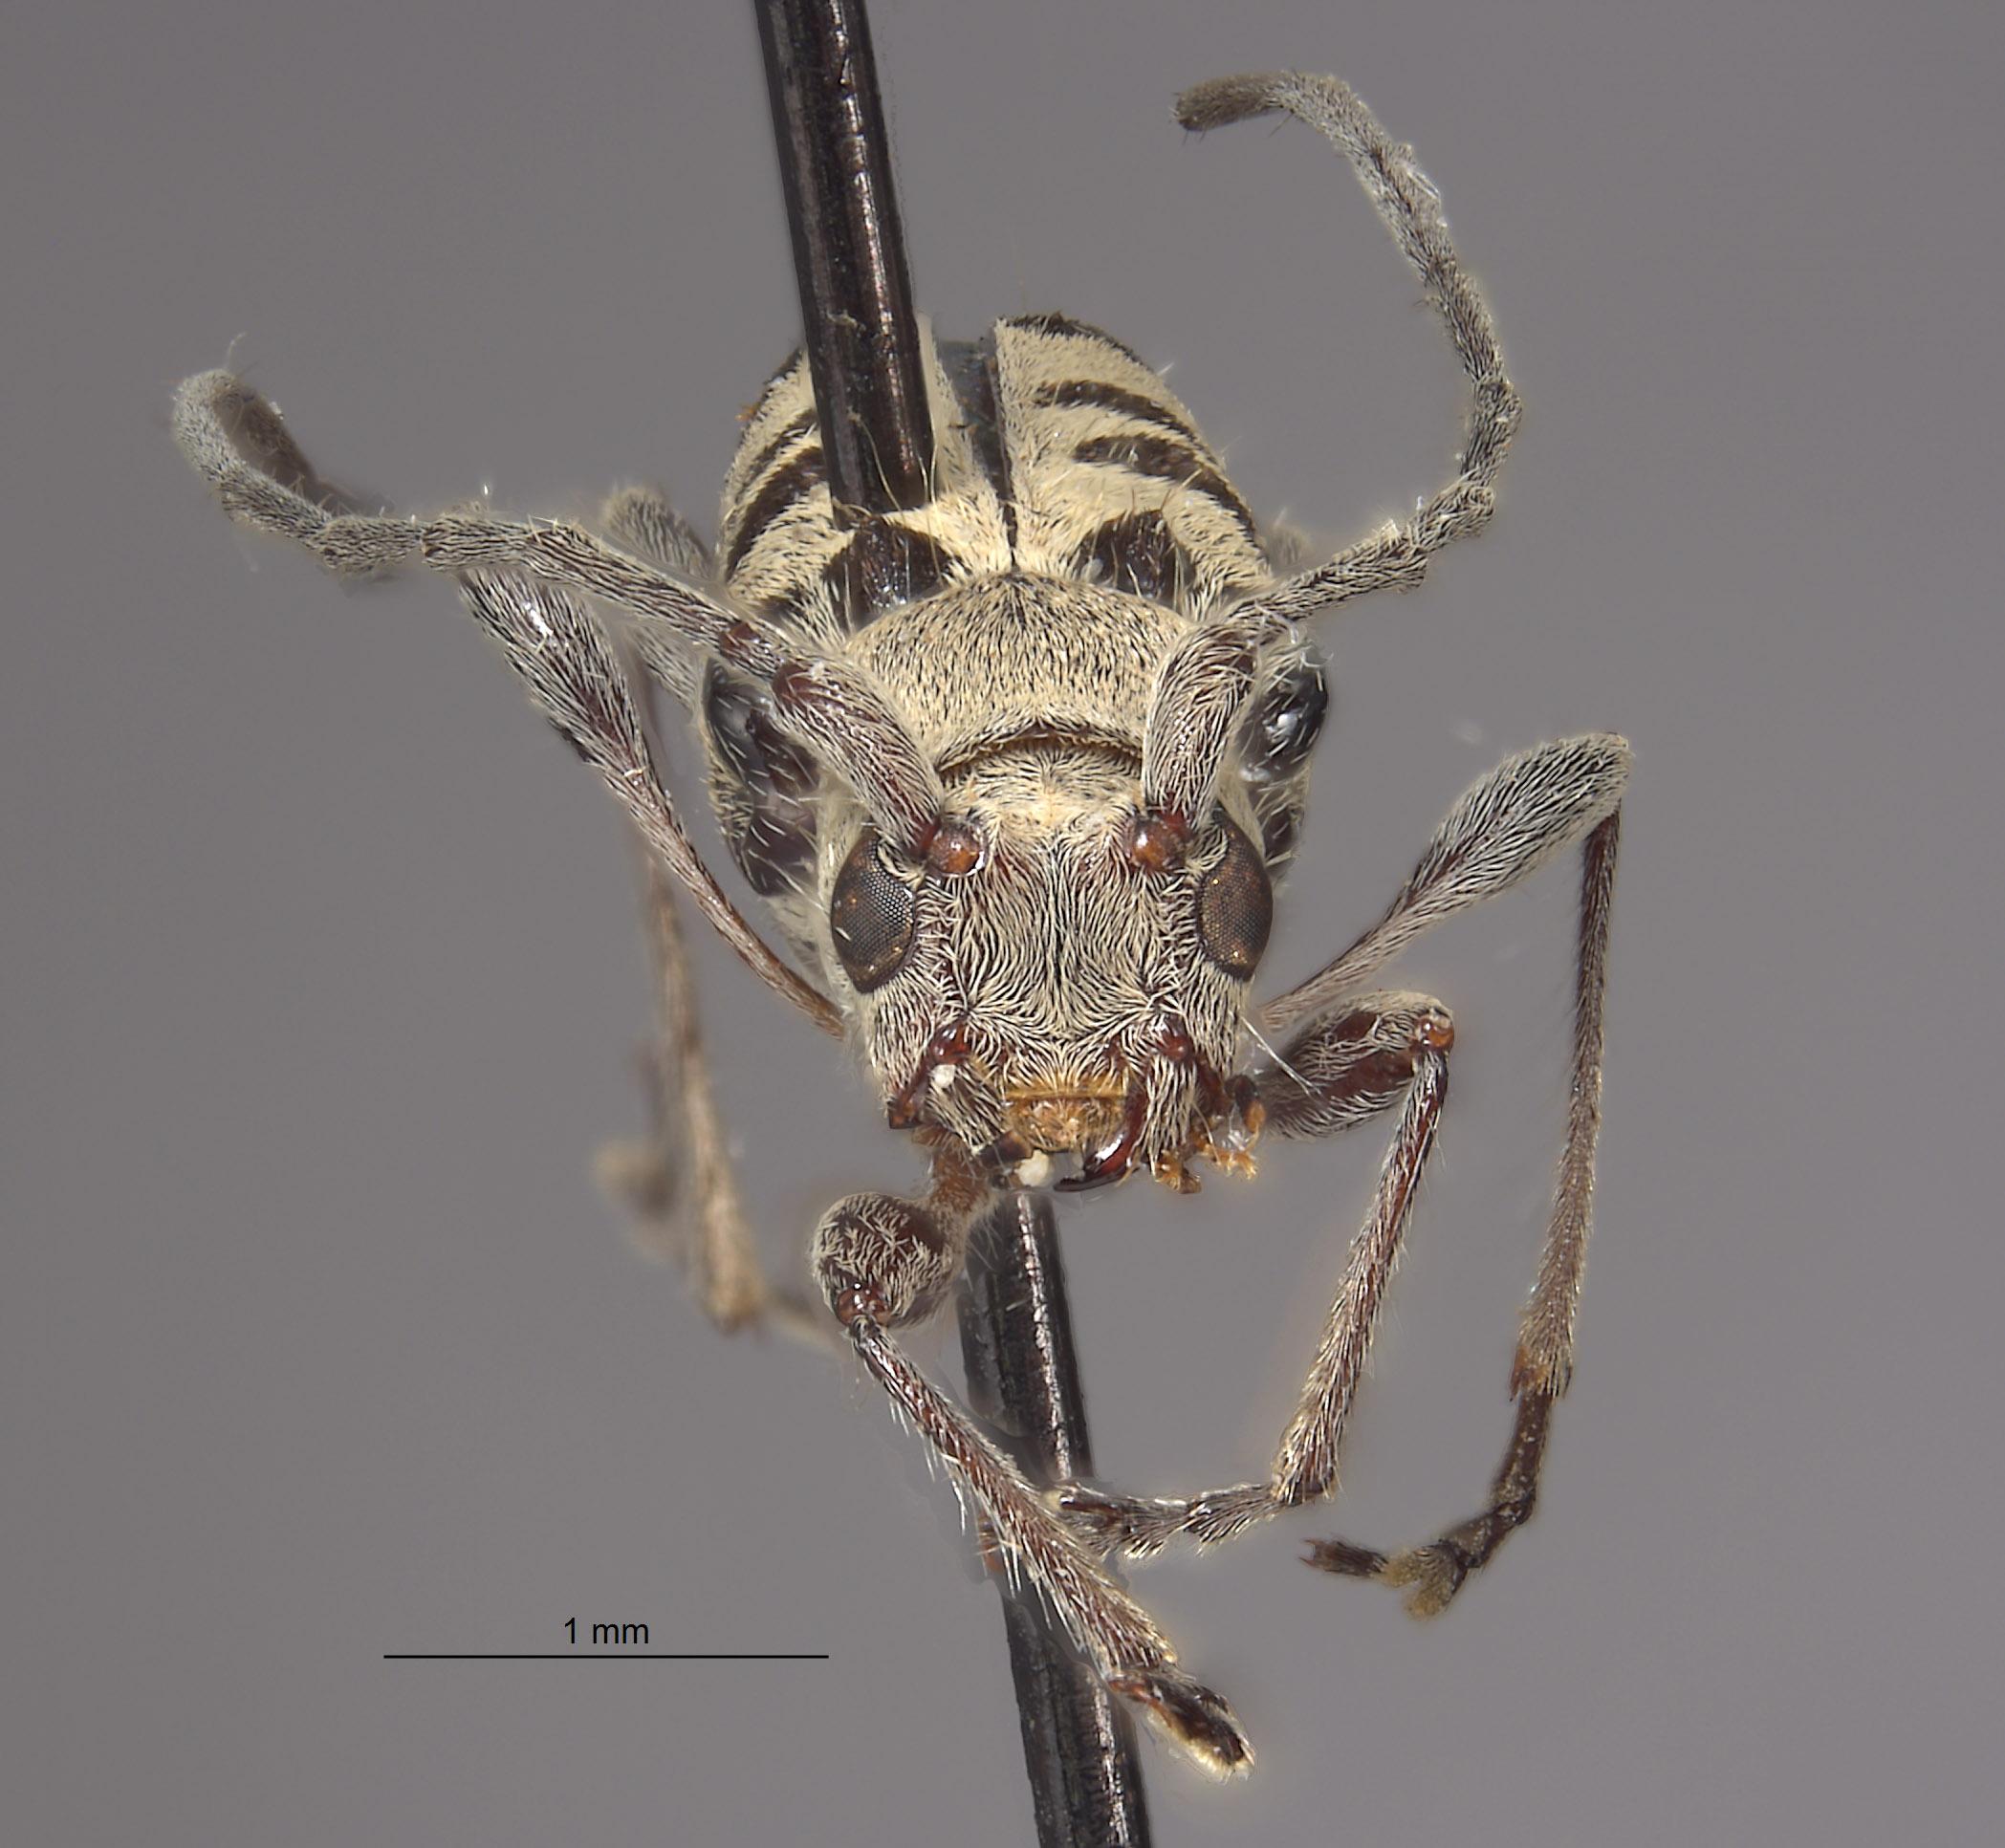 Aglaophis decemmaculatus image